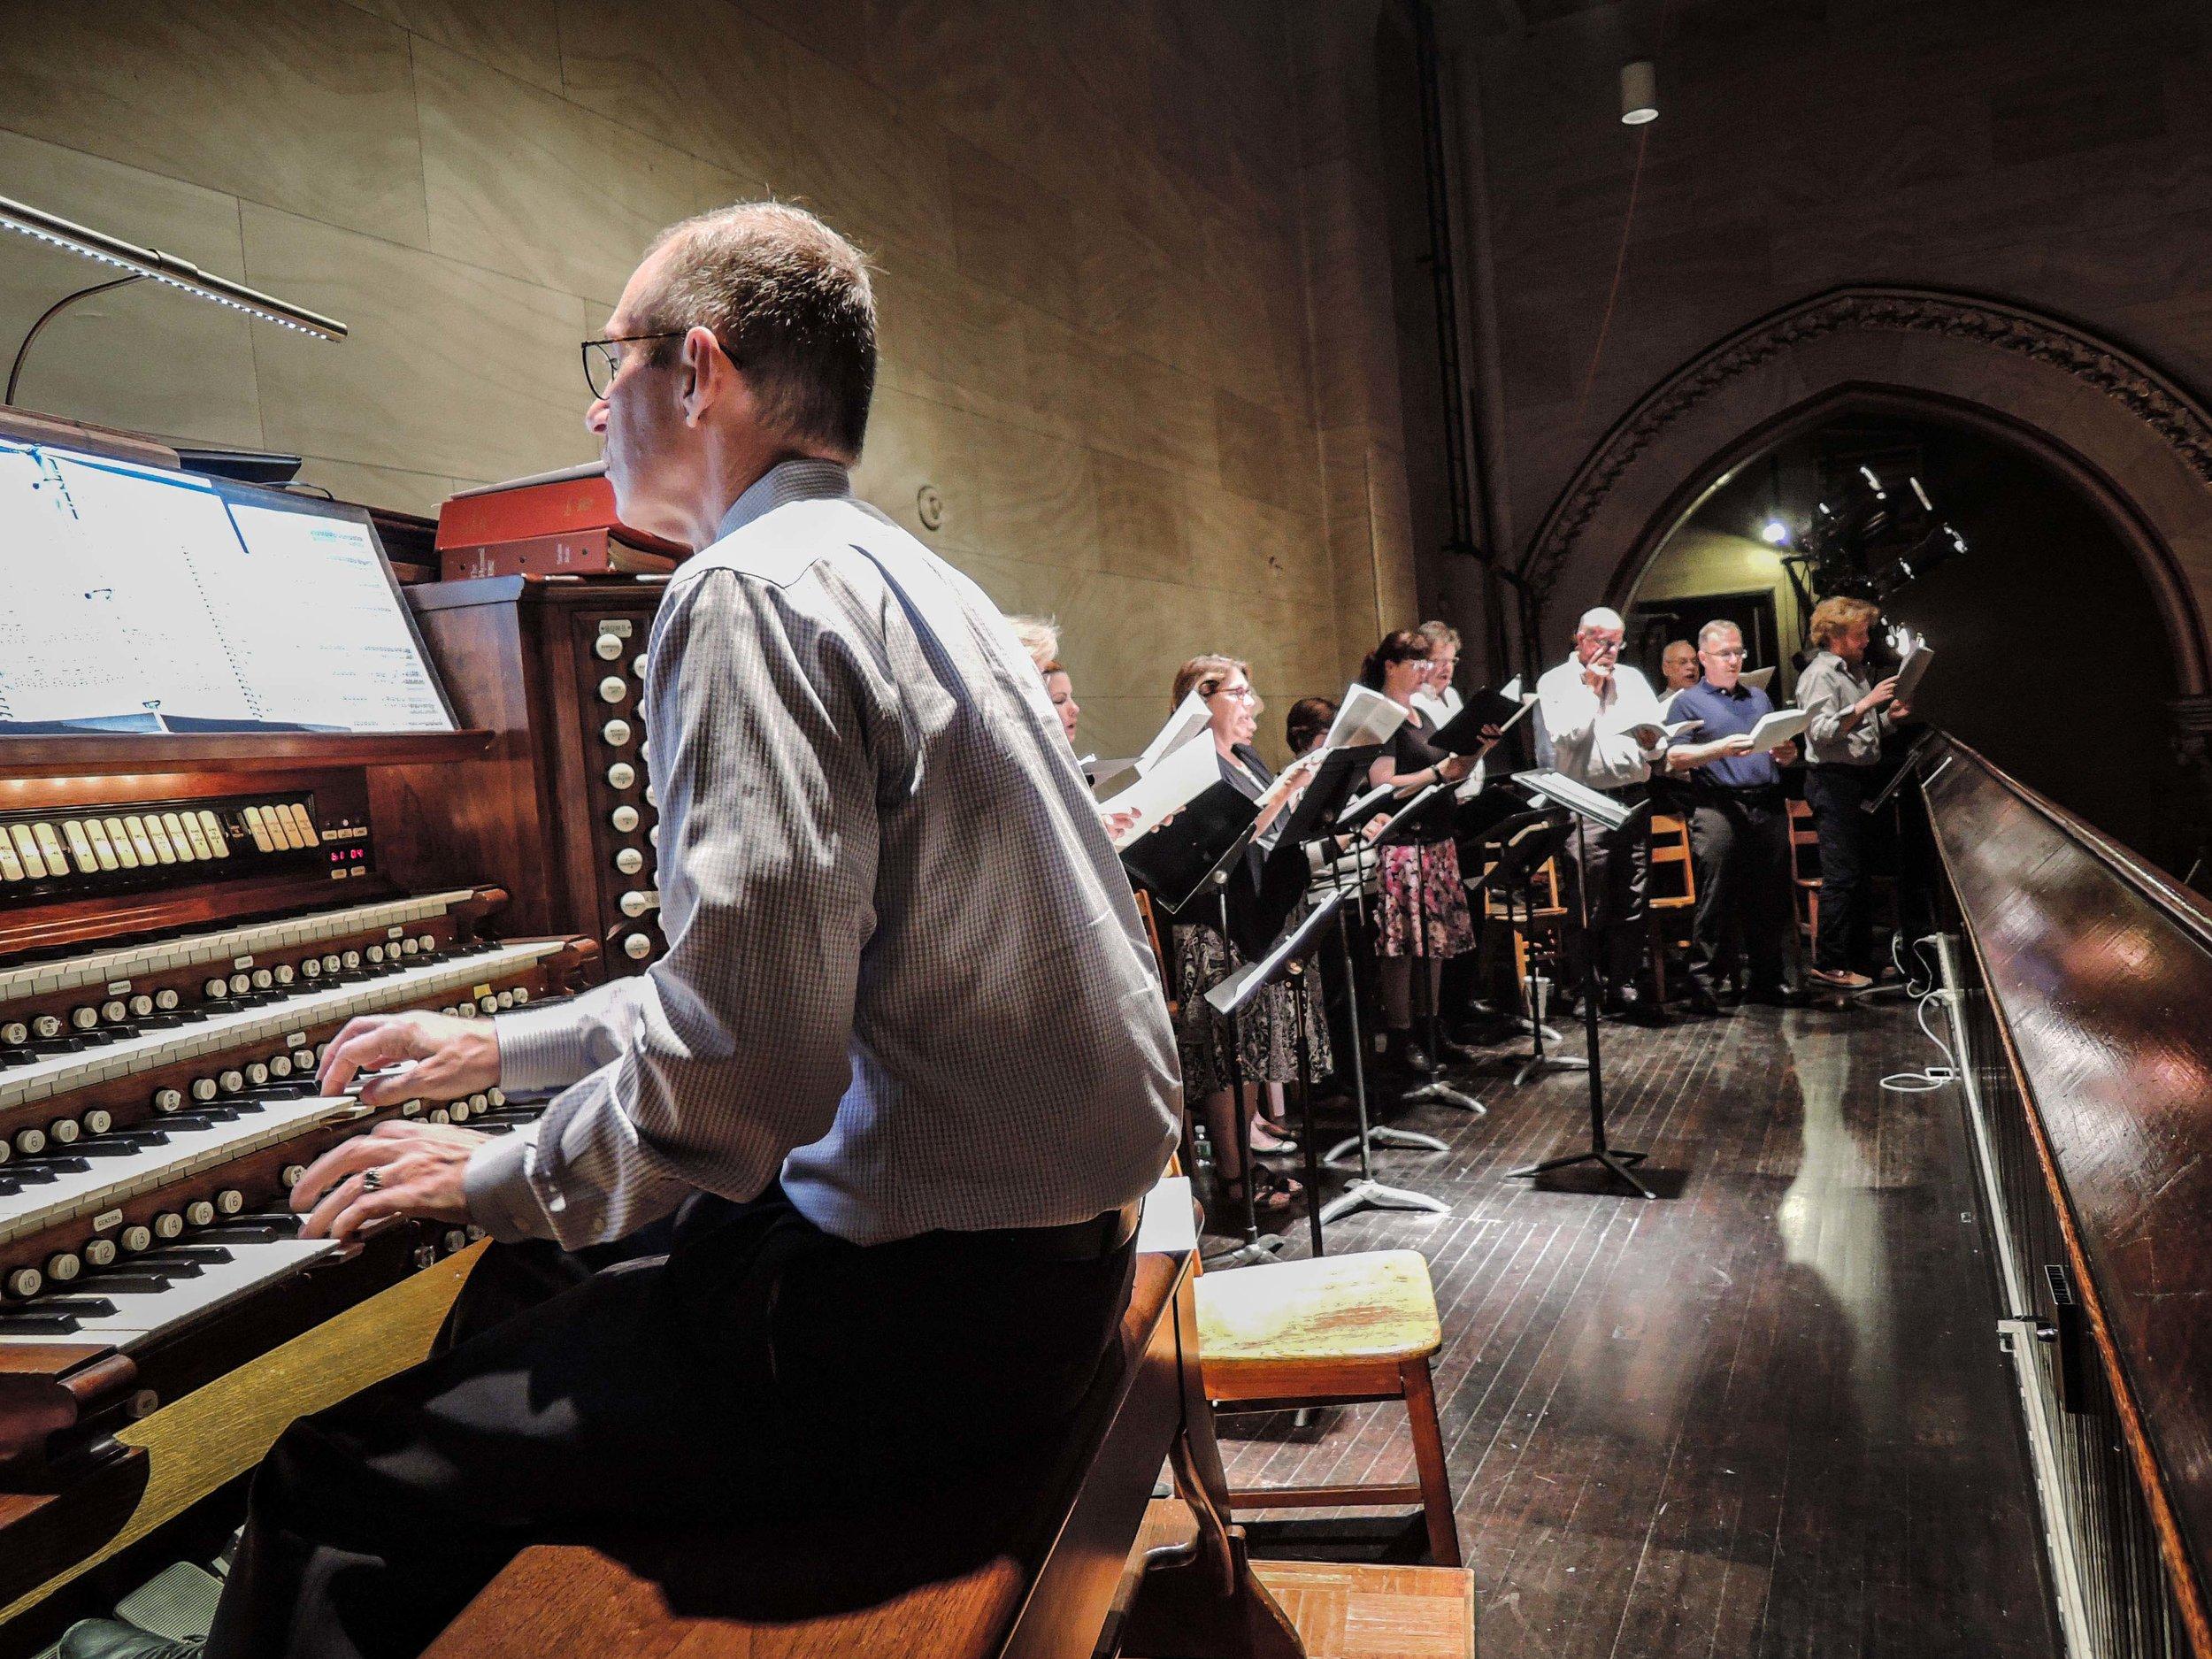 The choir of All Saints' Church, Austin, Texas, sang at the Solemn Mass. Gregory Eaton is organist and choir director.